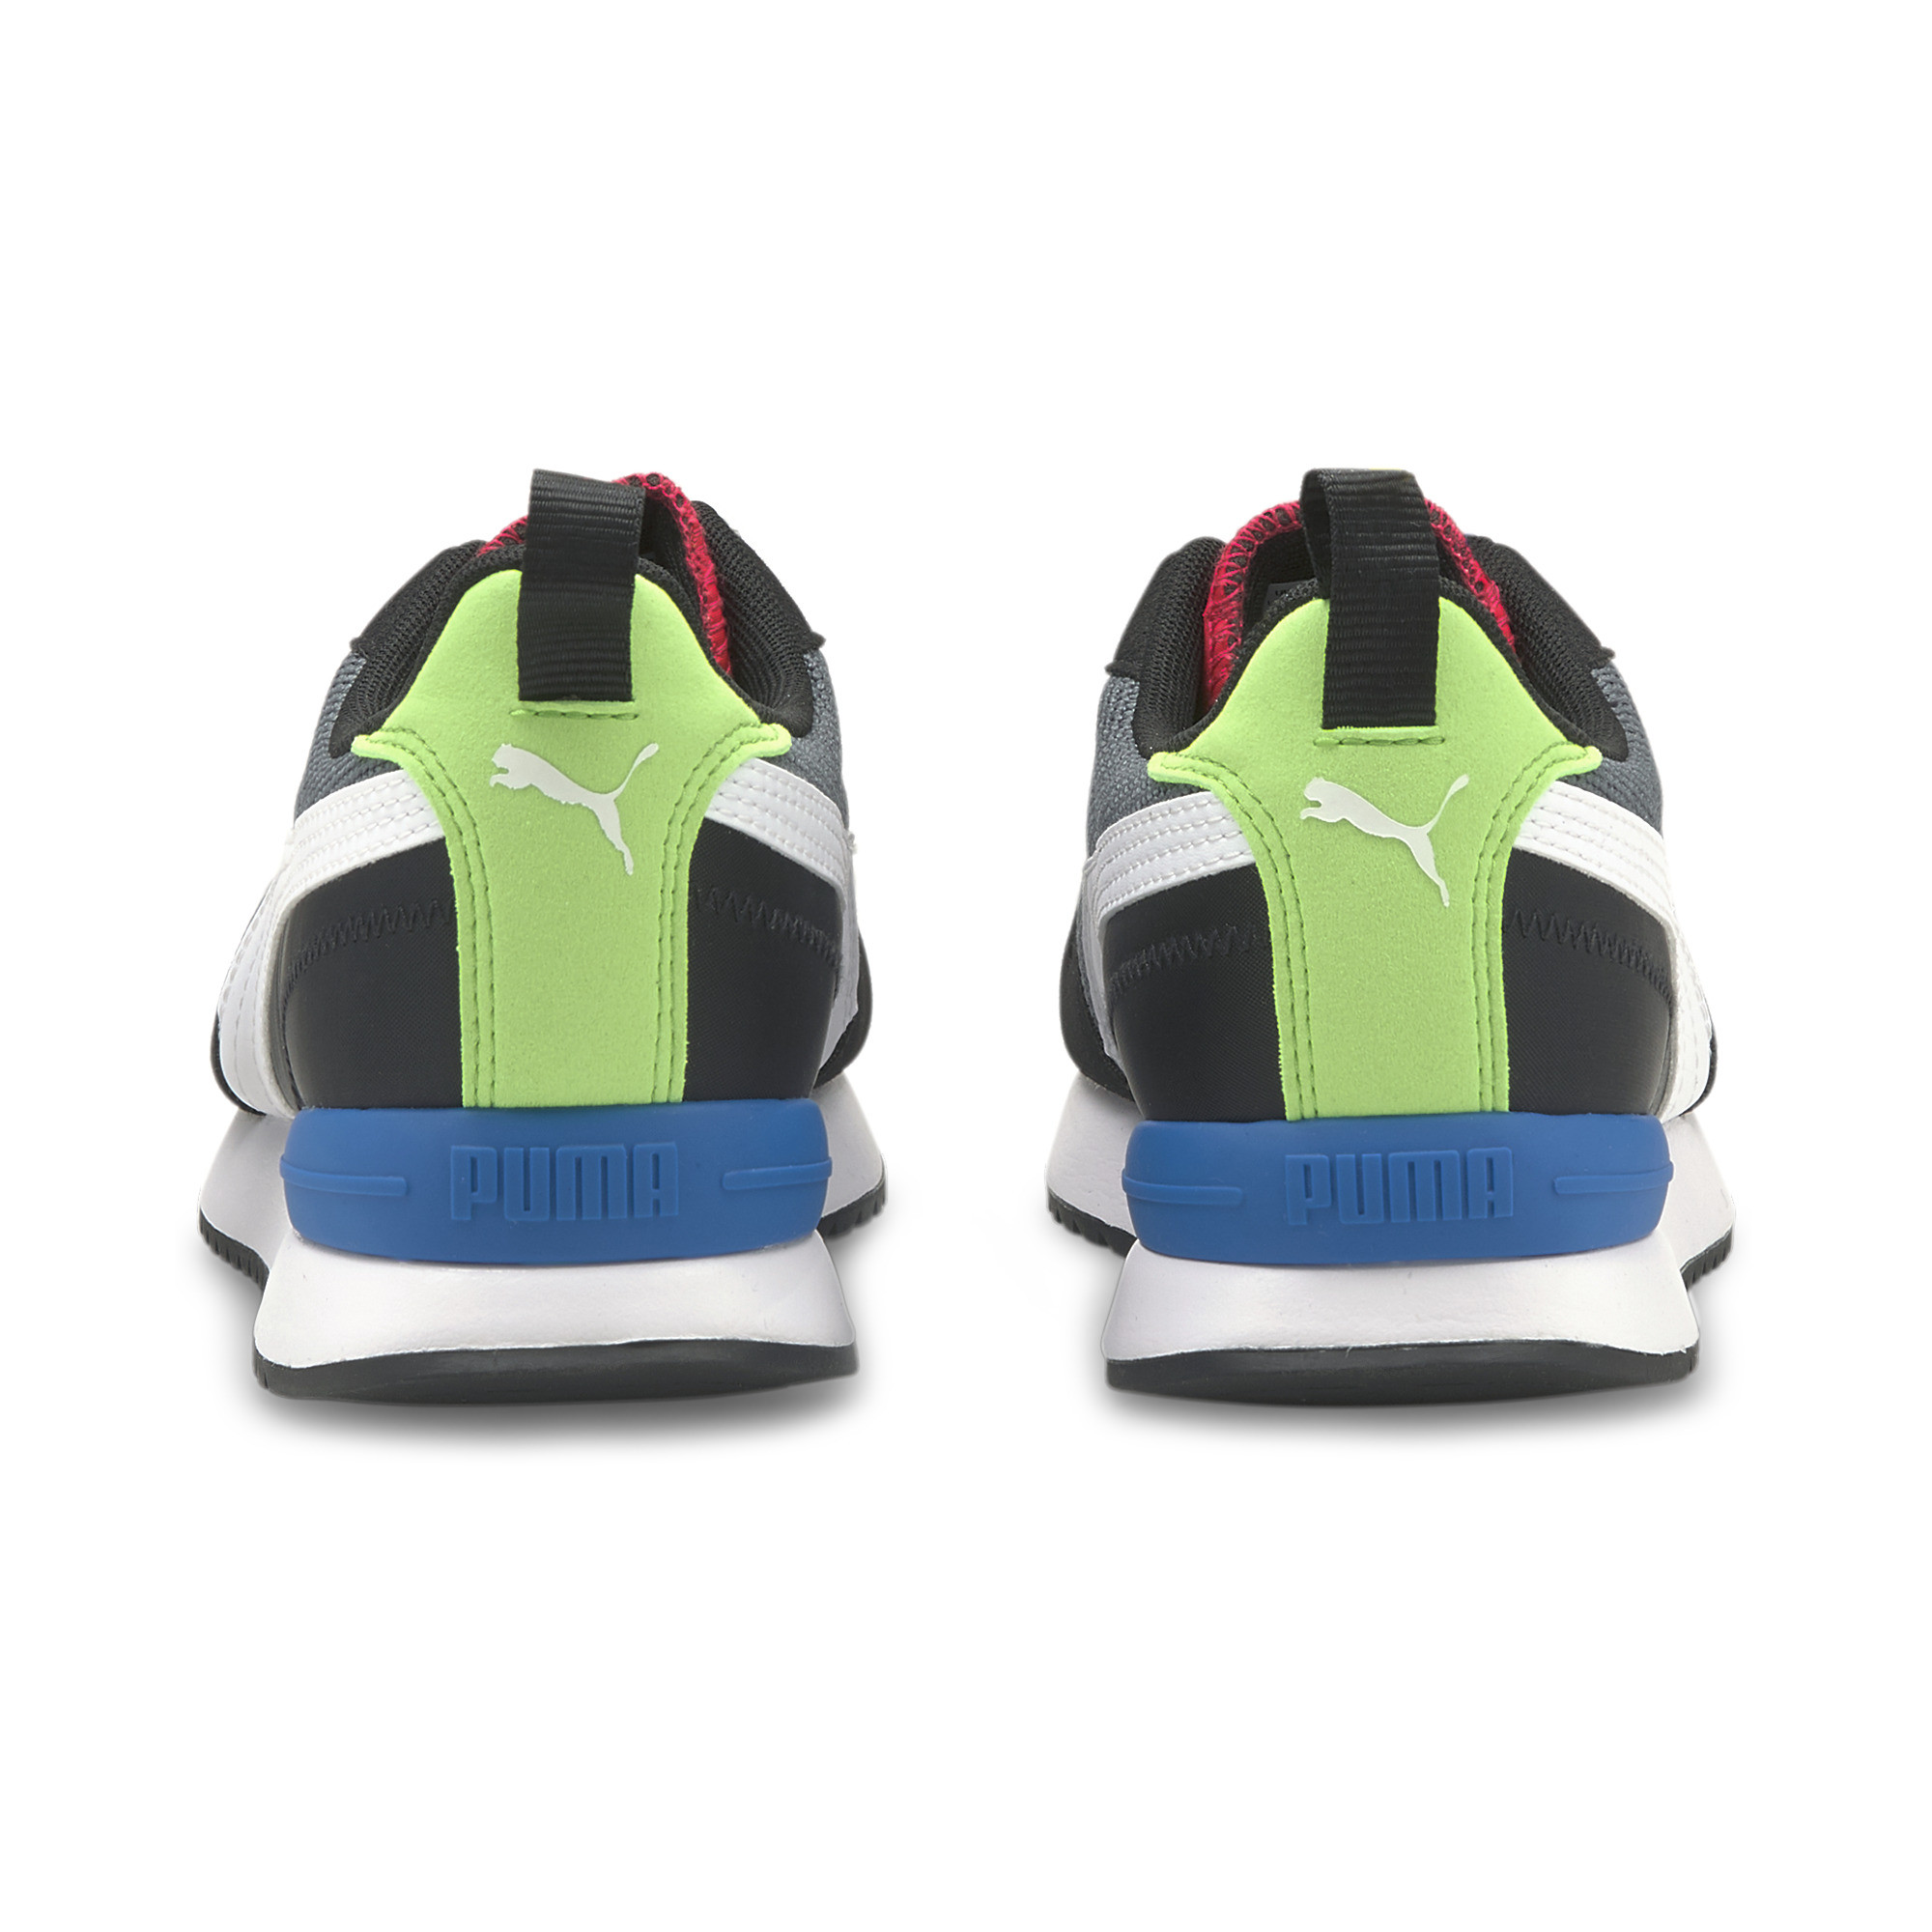 thumbnail 10 - PUMA Men's R78 Sneakers